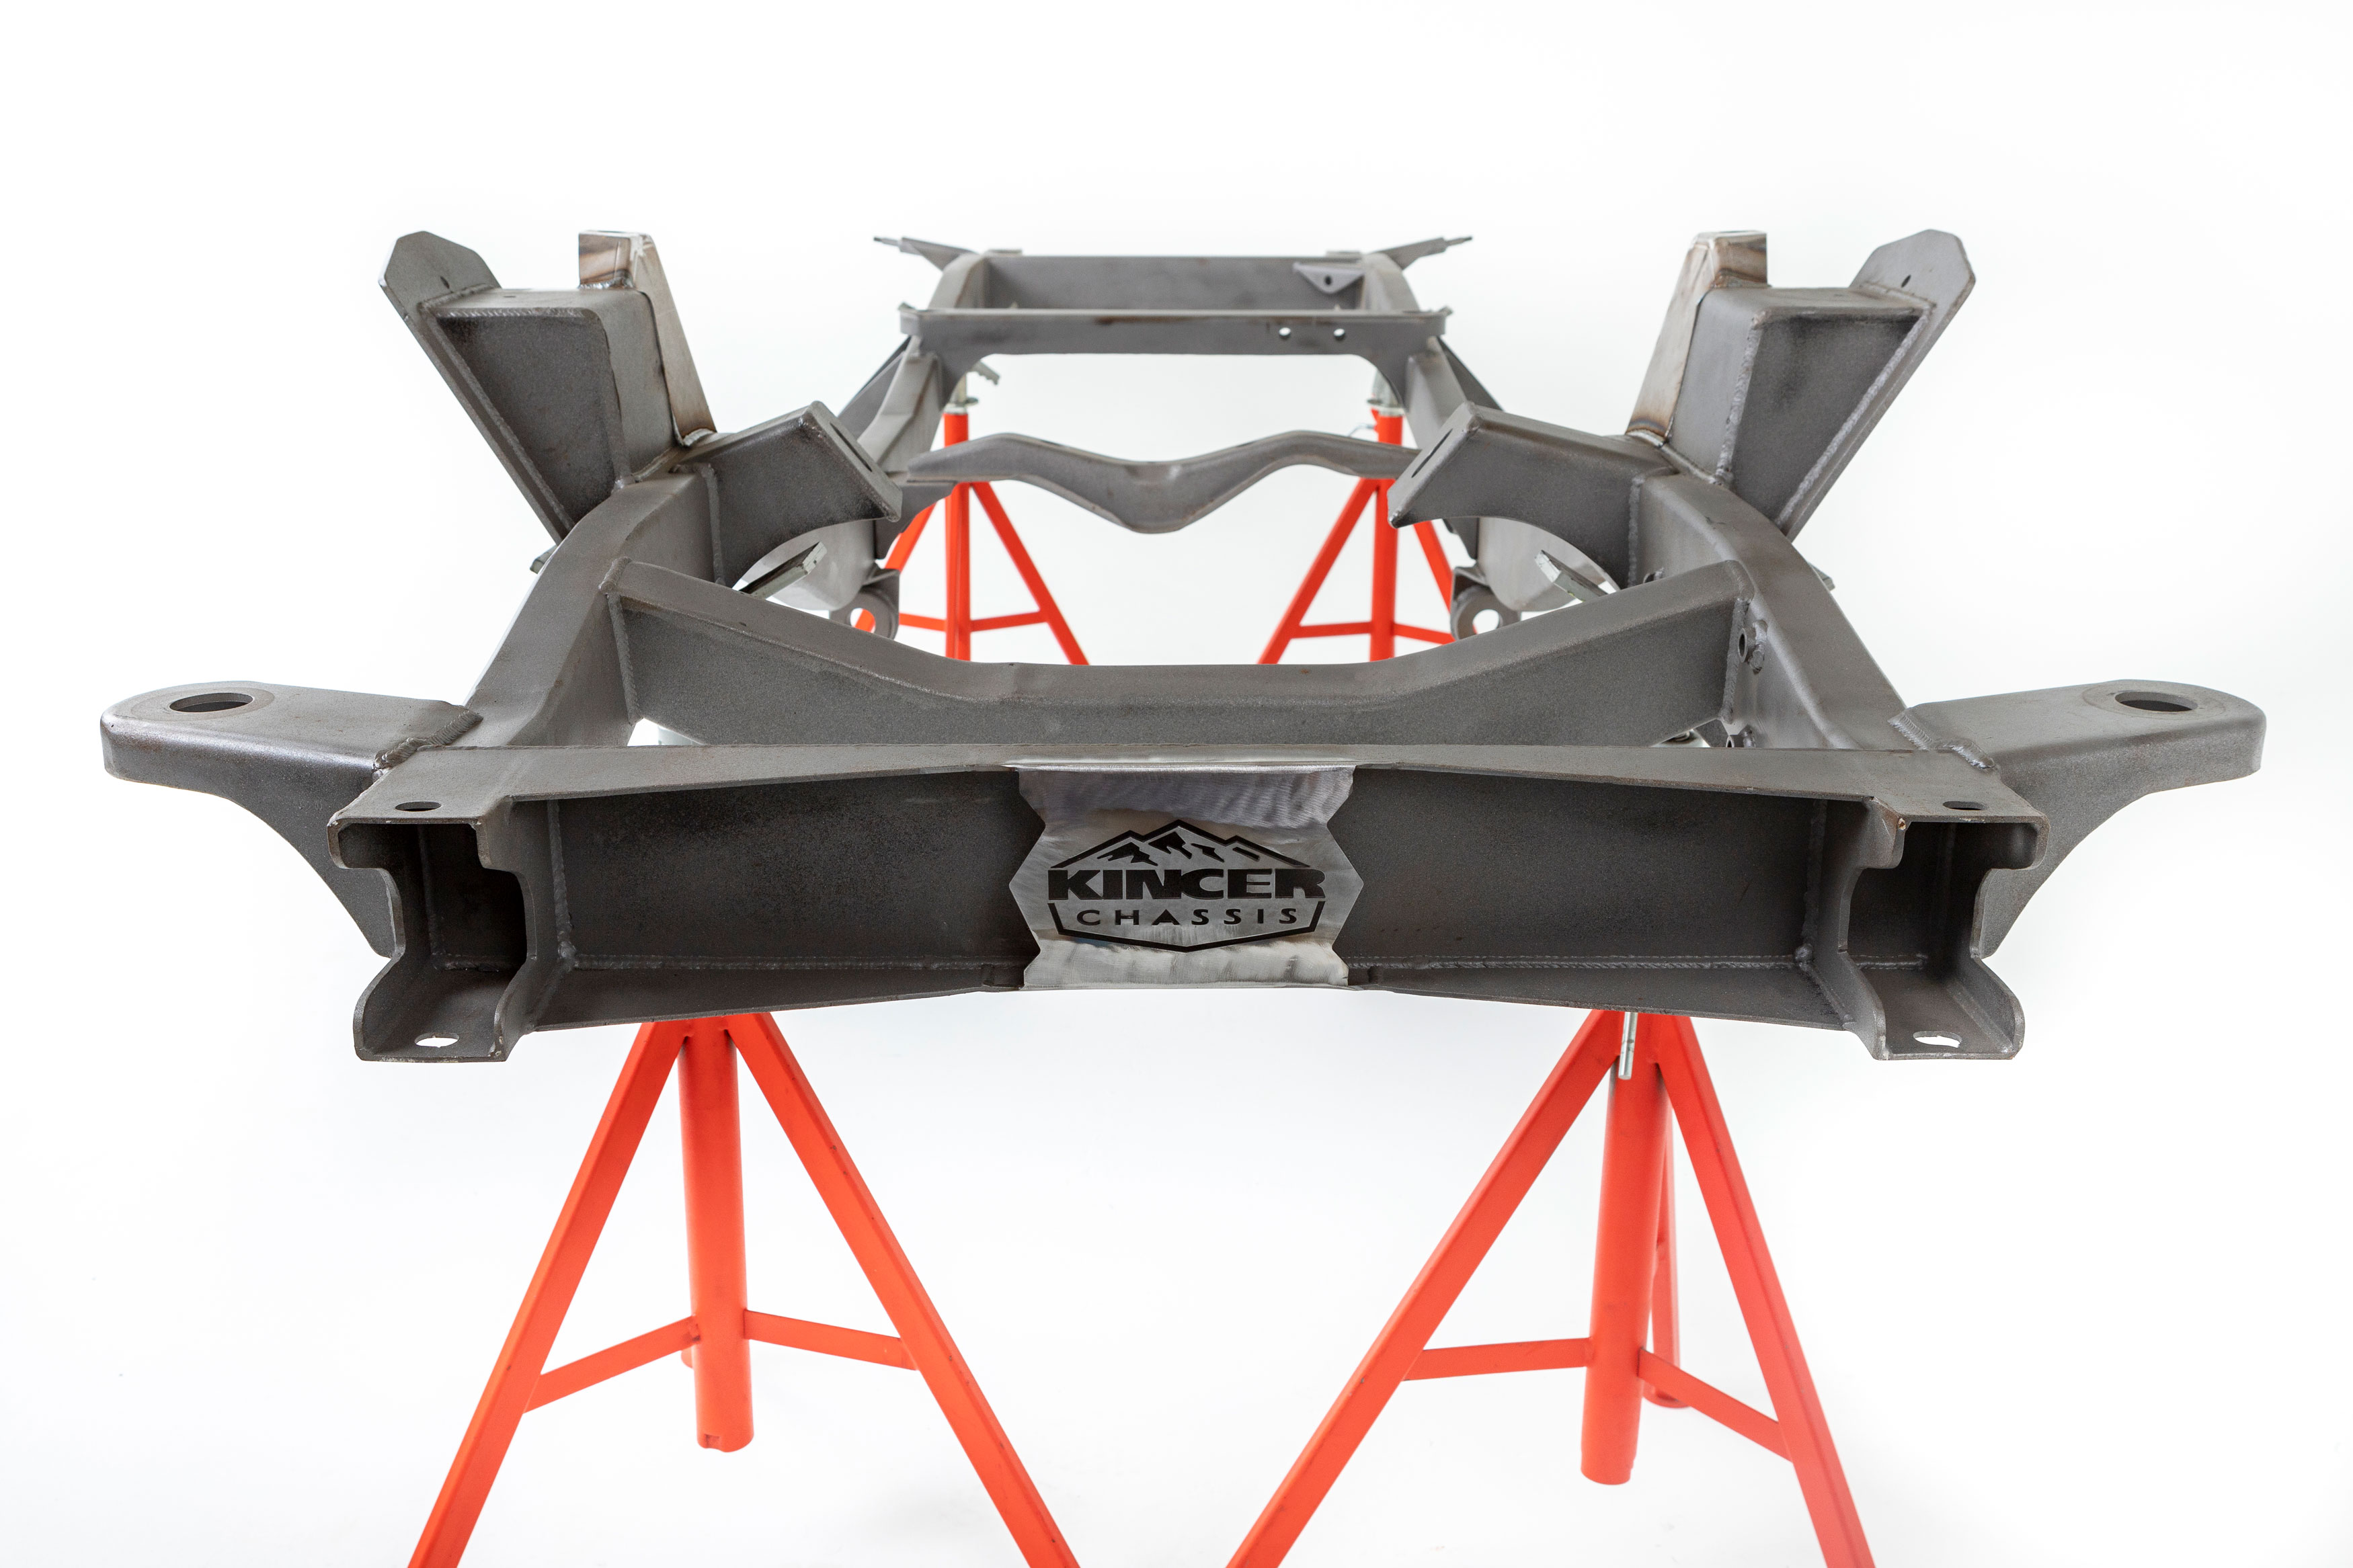 Kincer-Chassis-Early-Bronco-Blank-Frame_06